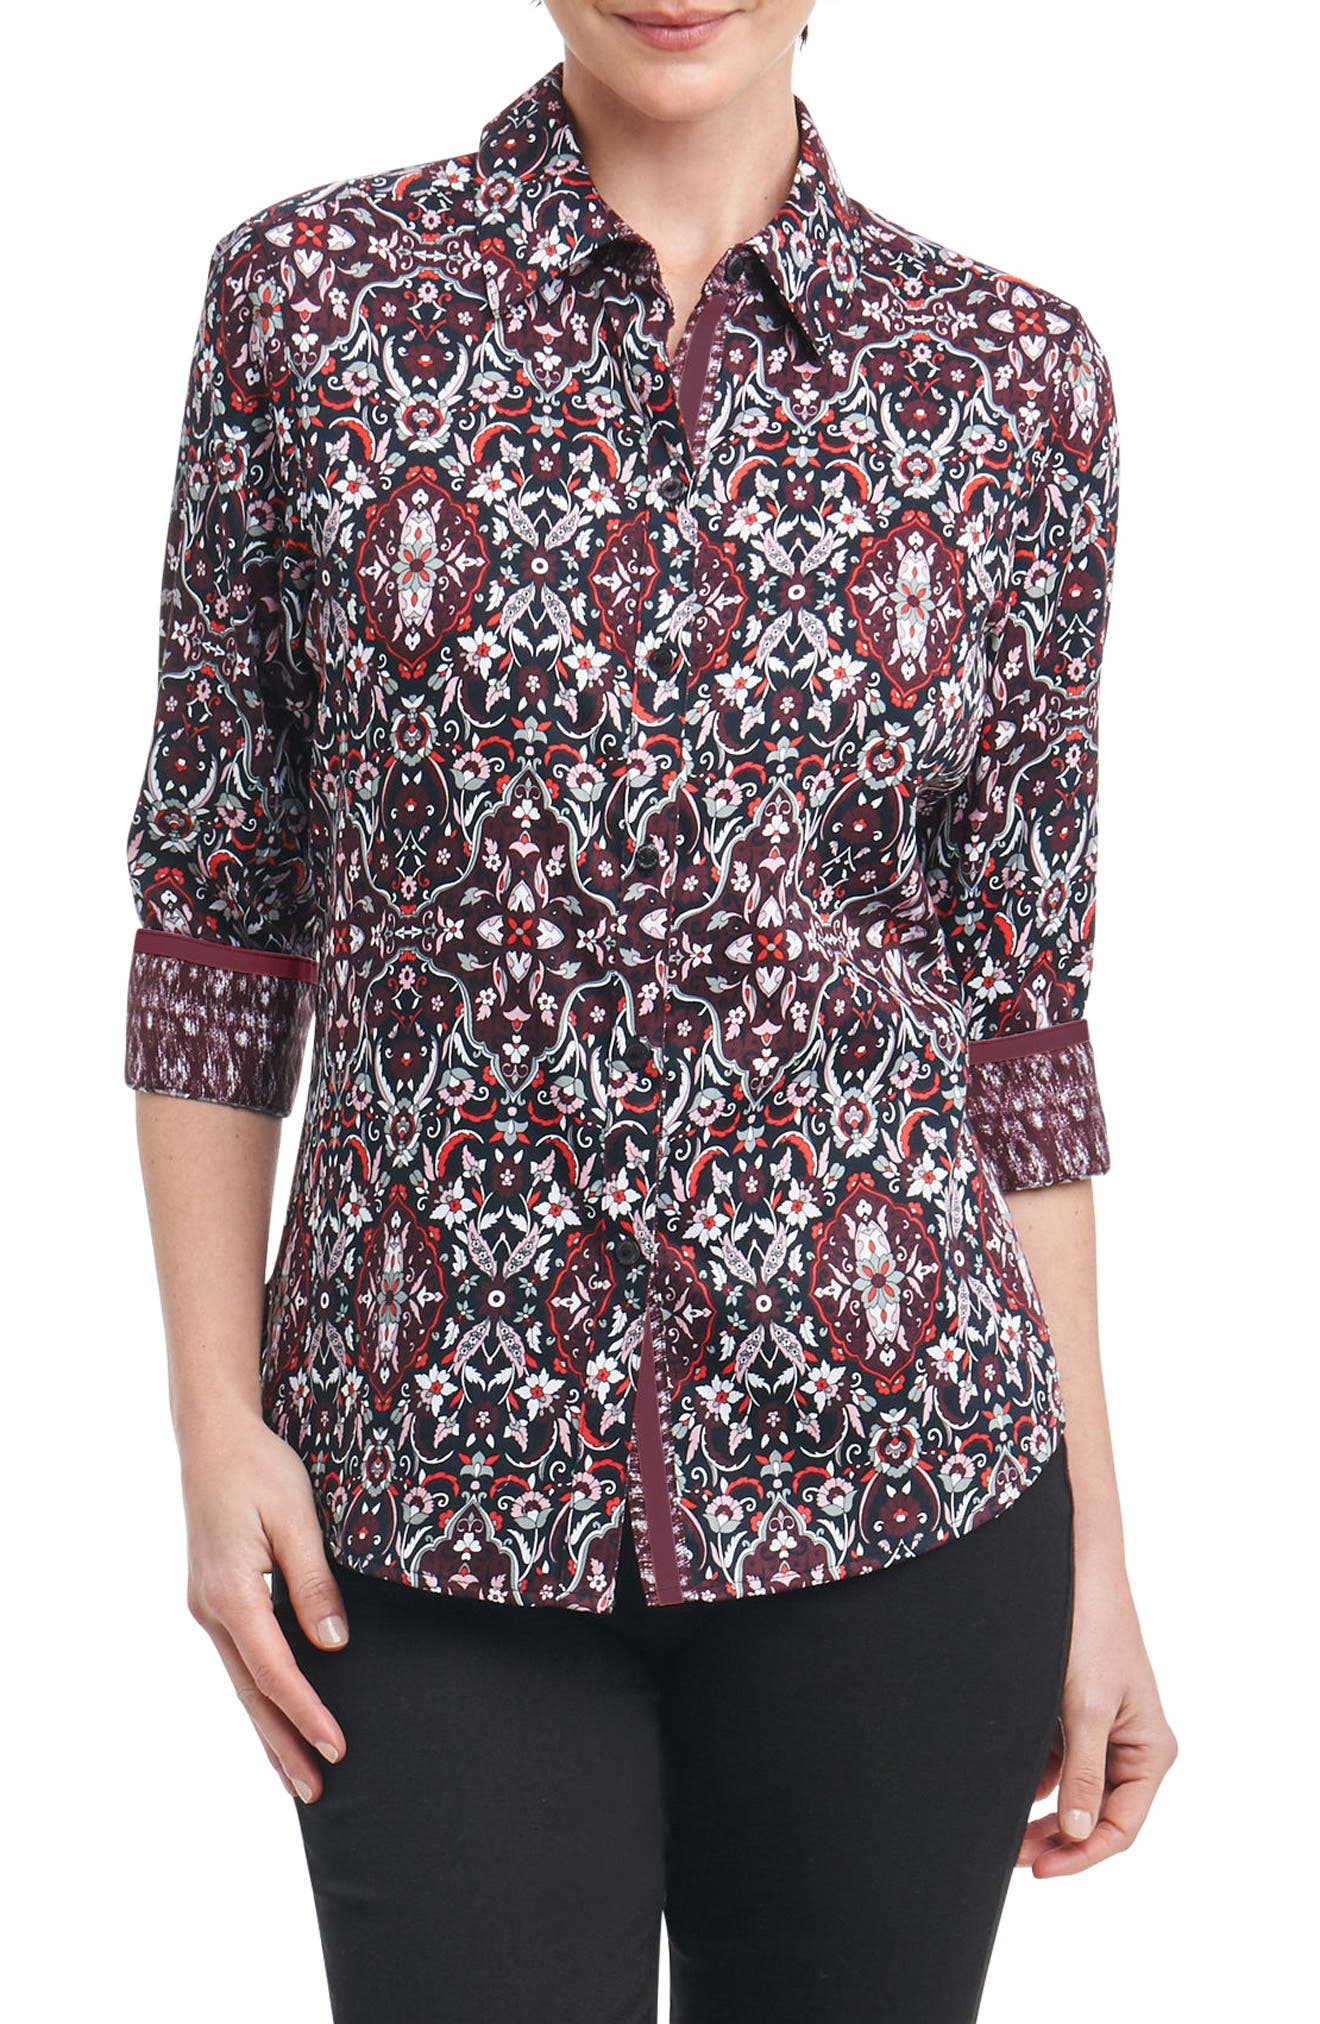 Ava Heirloom Paisley Shirt,                             Main thumbnail 1, color,                             Multi